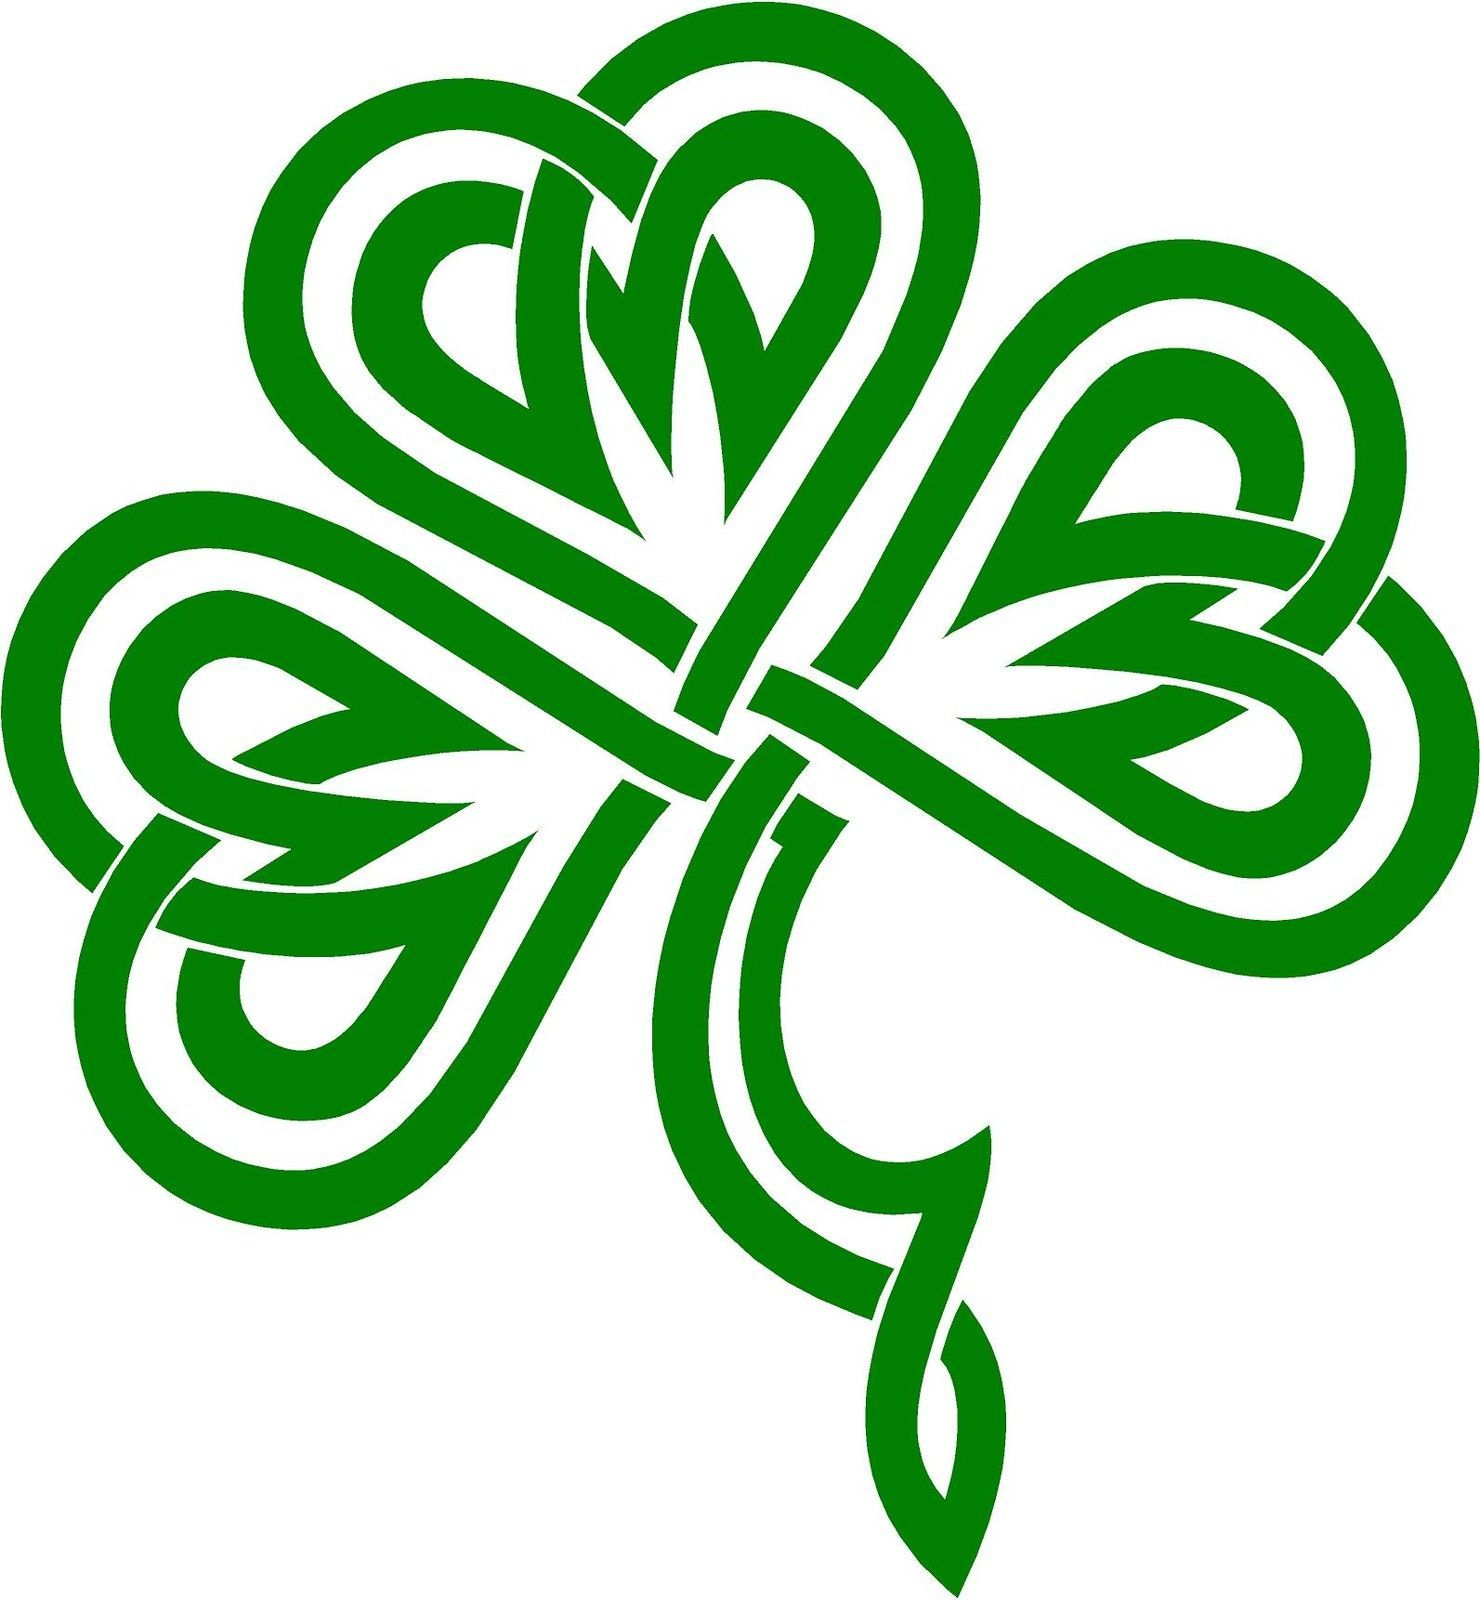 Chalkboard shamrock clipart banner freeuse Celtic shamrock clipart 3 » Clipart Station banner freeuse